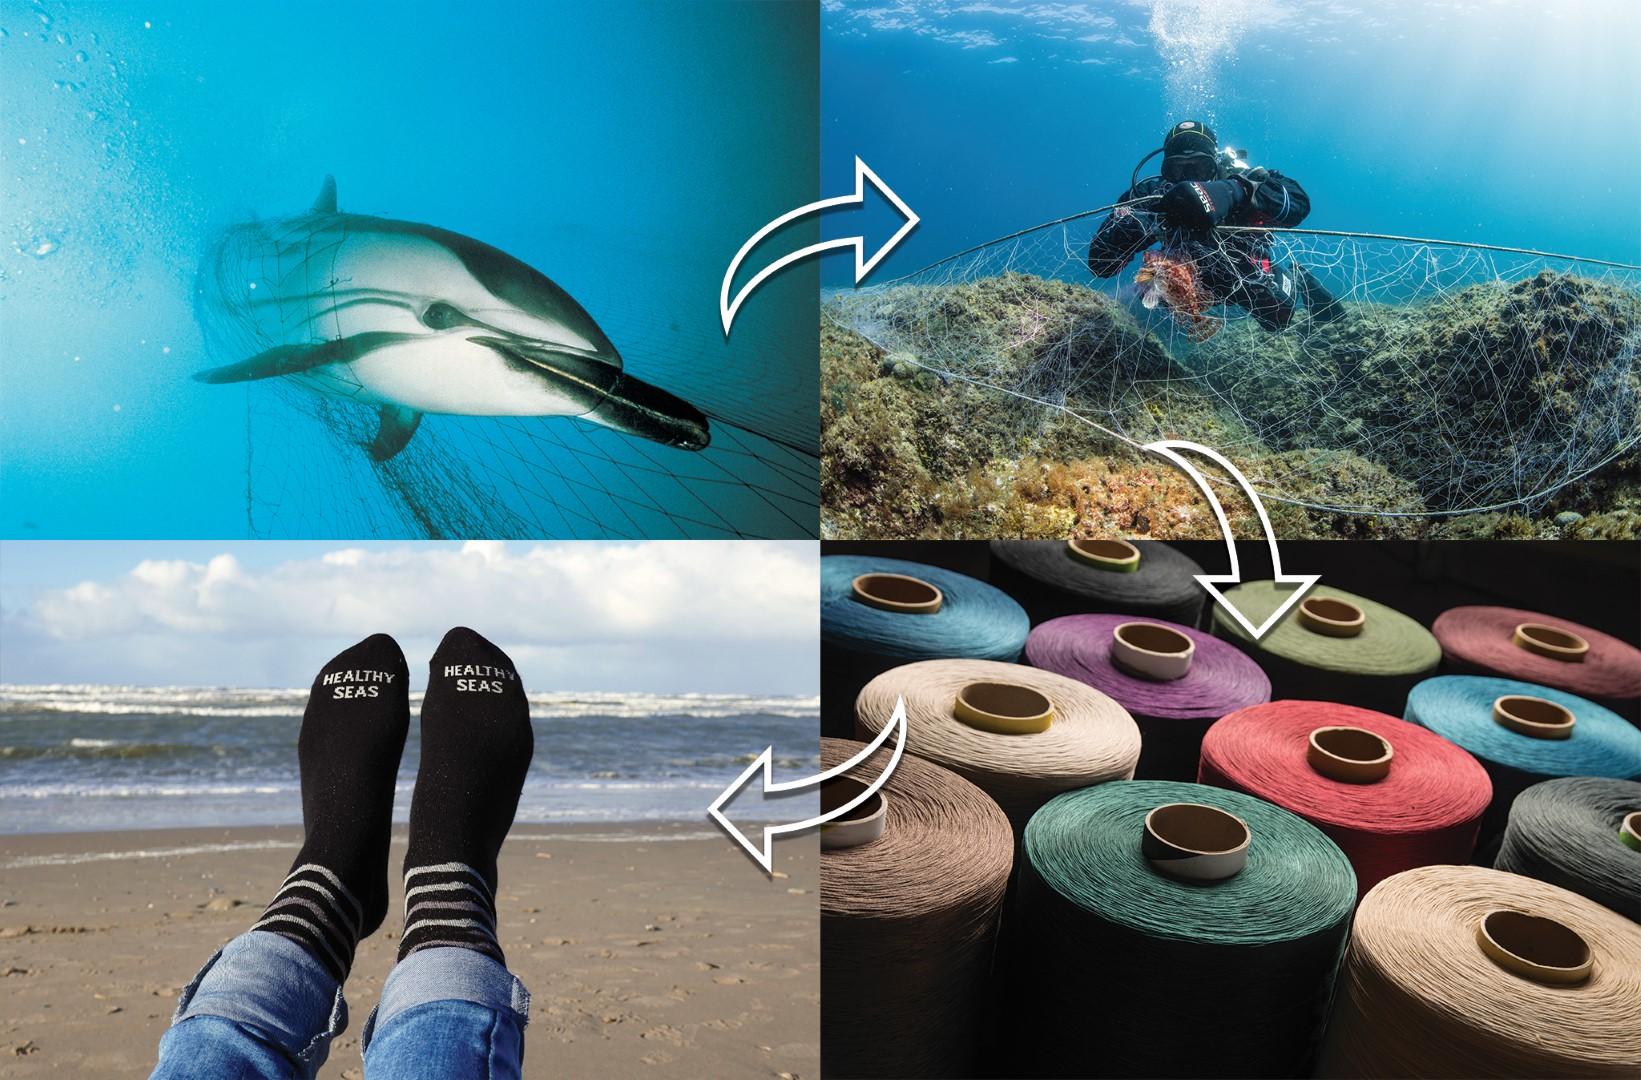 Healthy Seas-collage-newsocks2017 (Large).jpg